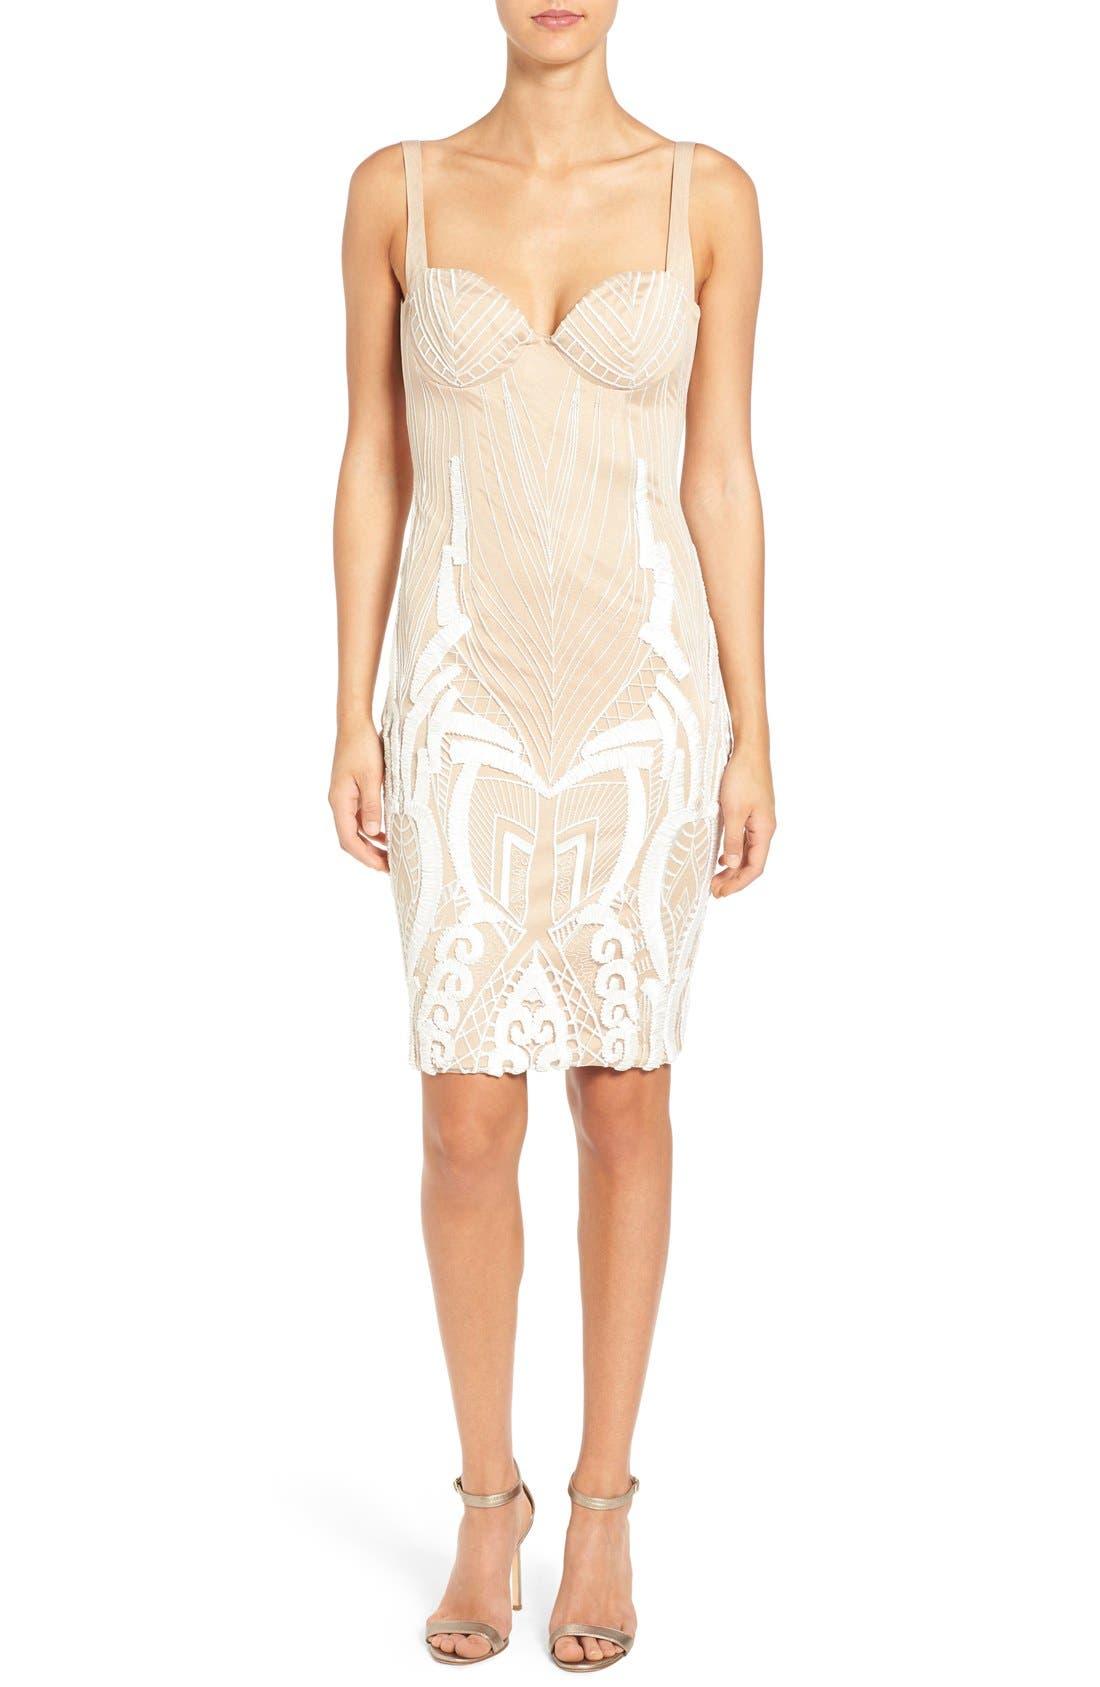 'Cara' Backless Ribbon Lace Embroidered Tulle Sheath Dress,                             Main thumbnail 1, color,                             901